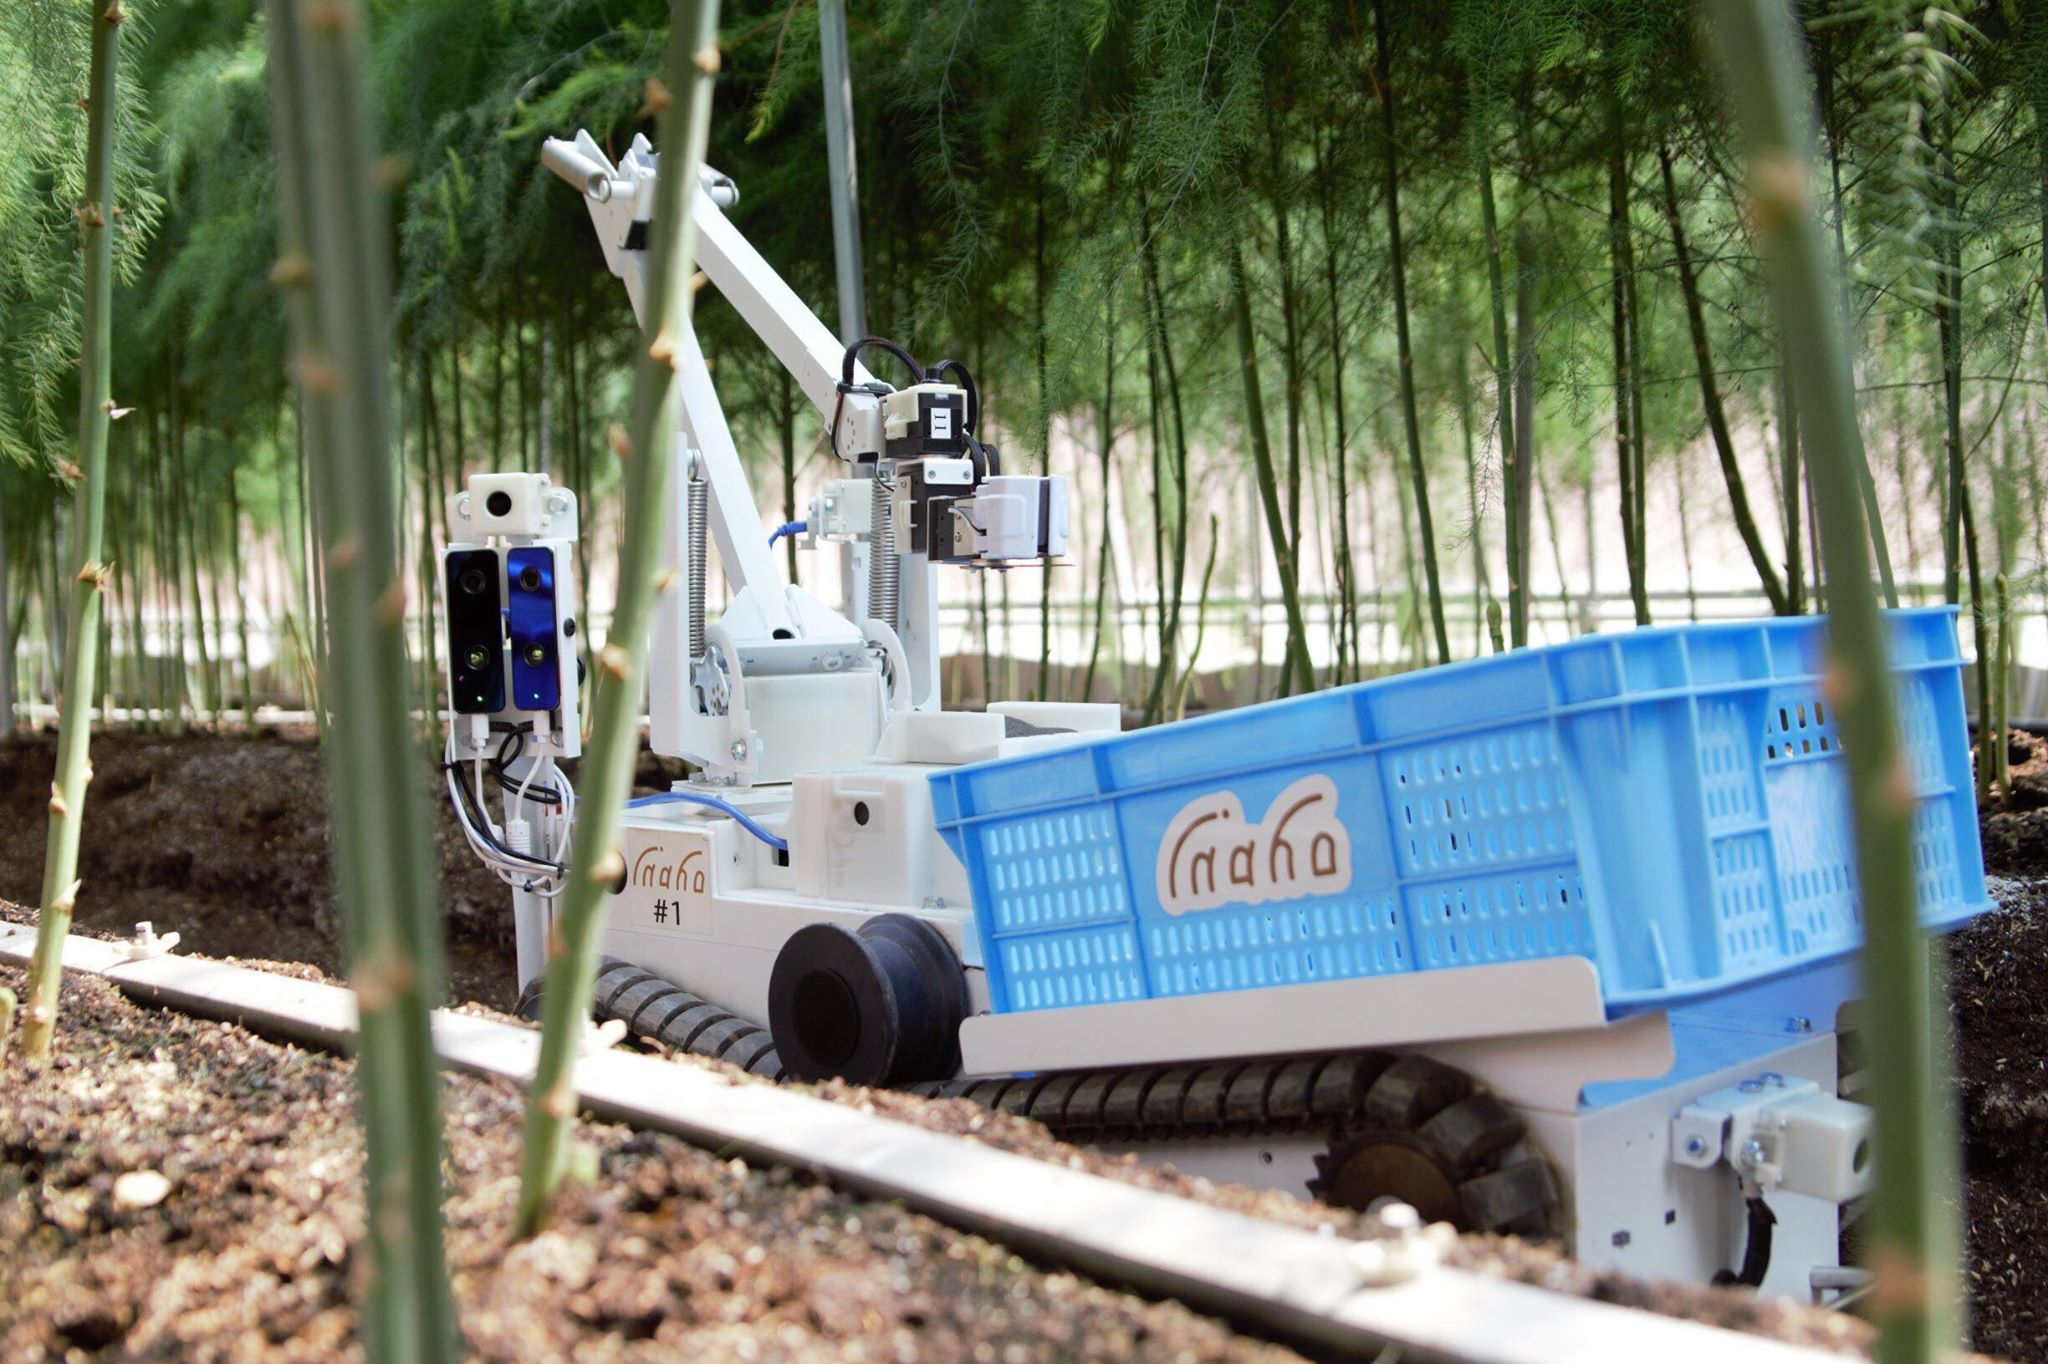 inahoの自動野菜収穫ロボットがアスパラガスを採っている様子